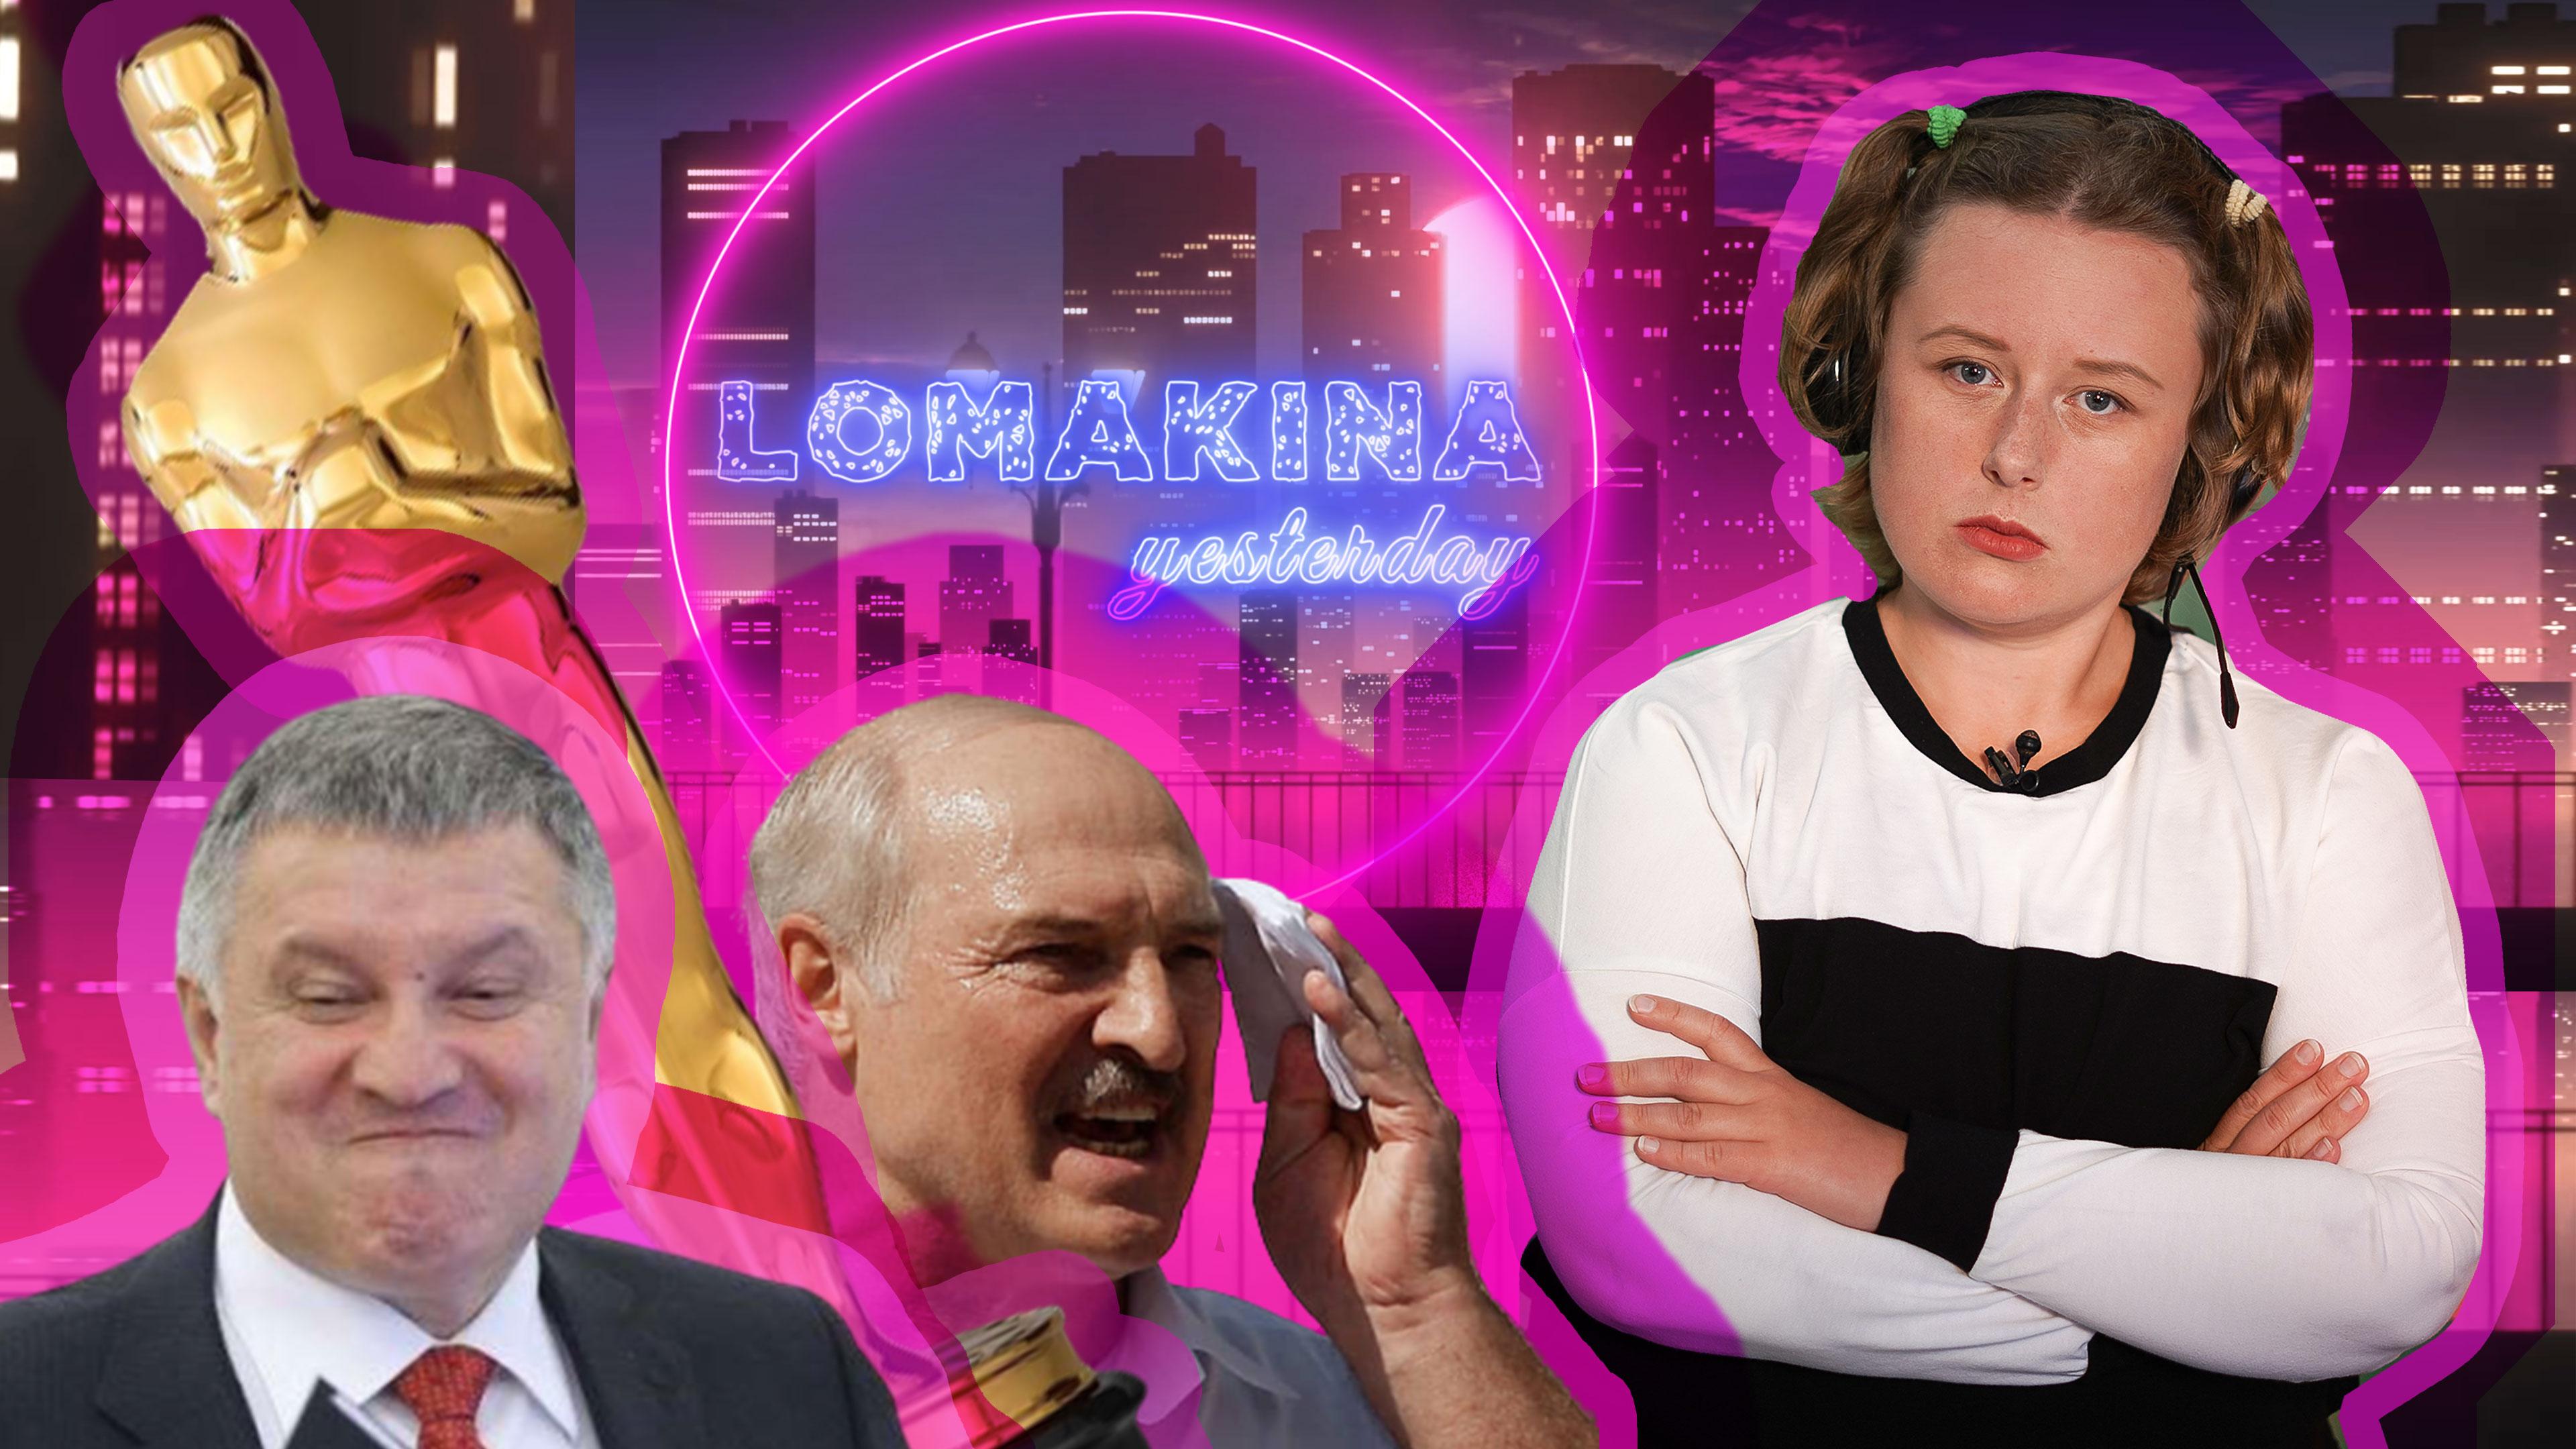 Театр Лукашенка, реклама Верещук і геймери-спортсмени / Lomakina Yesterday #8